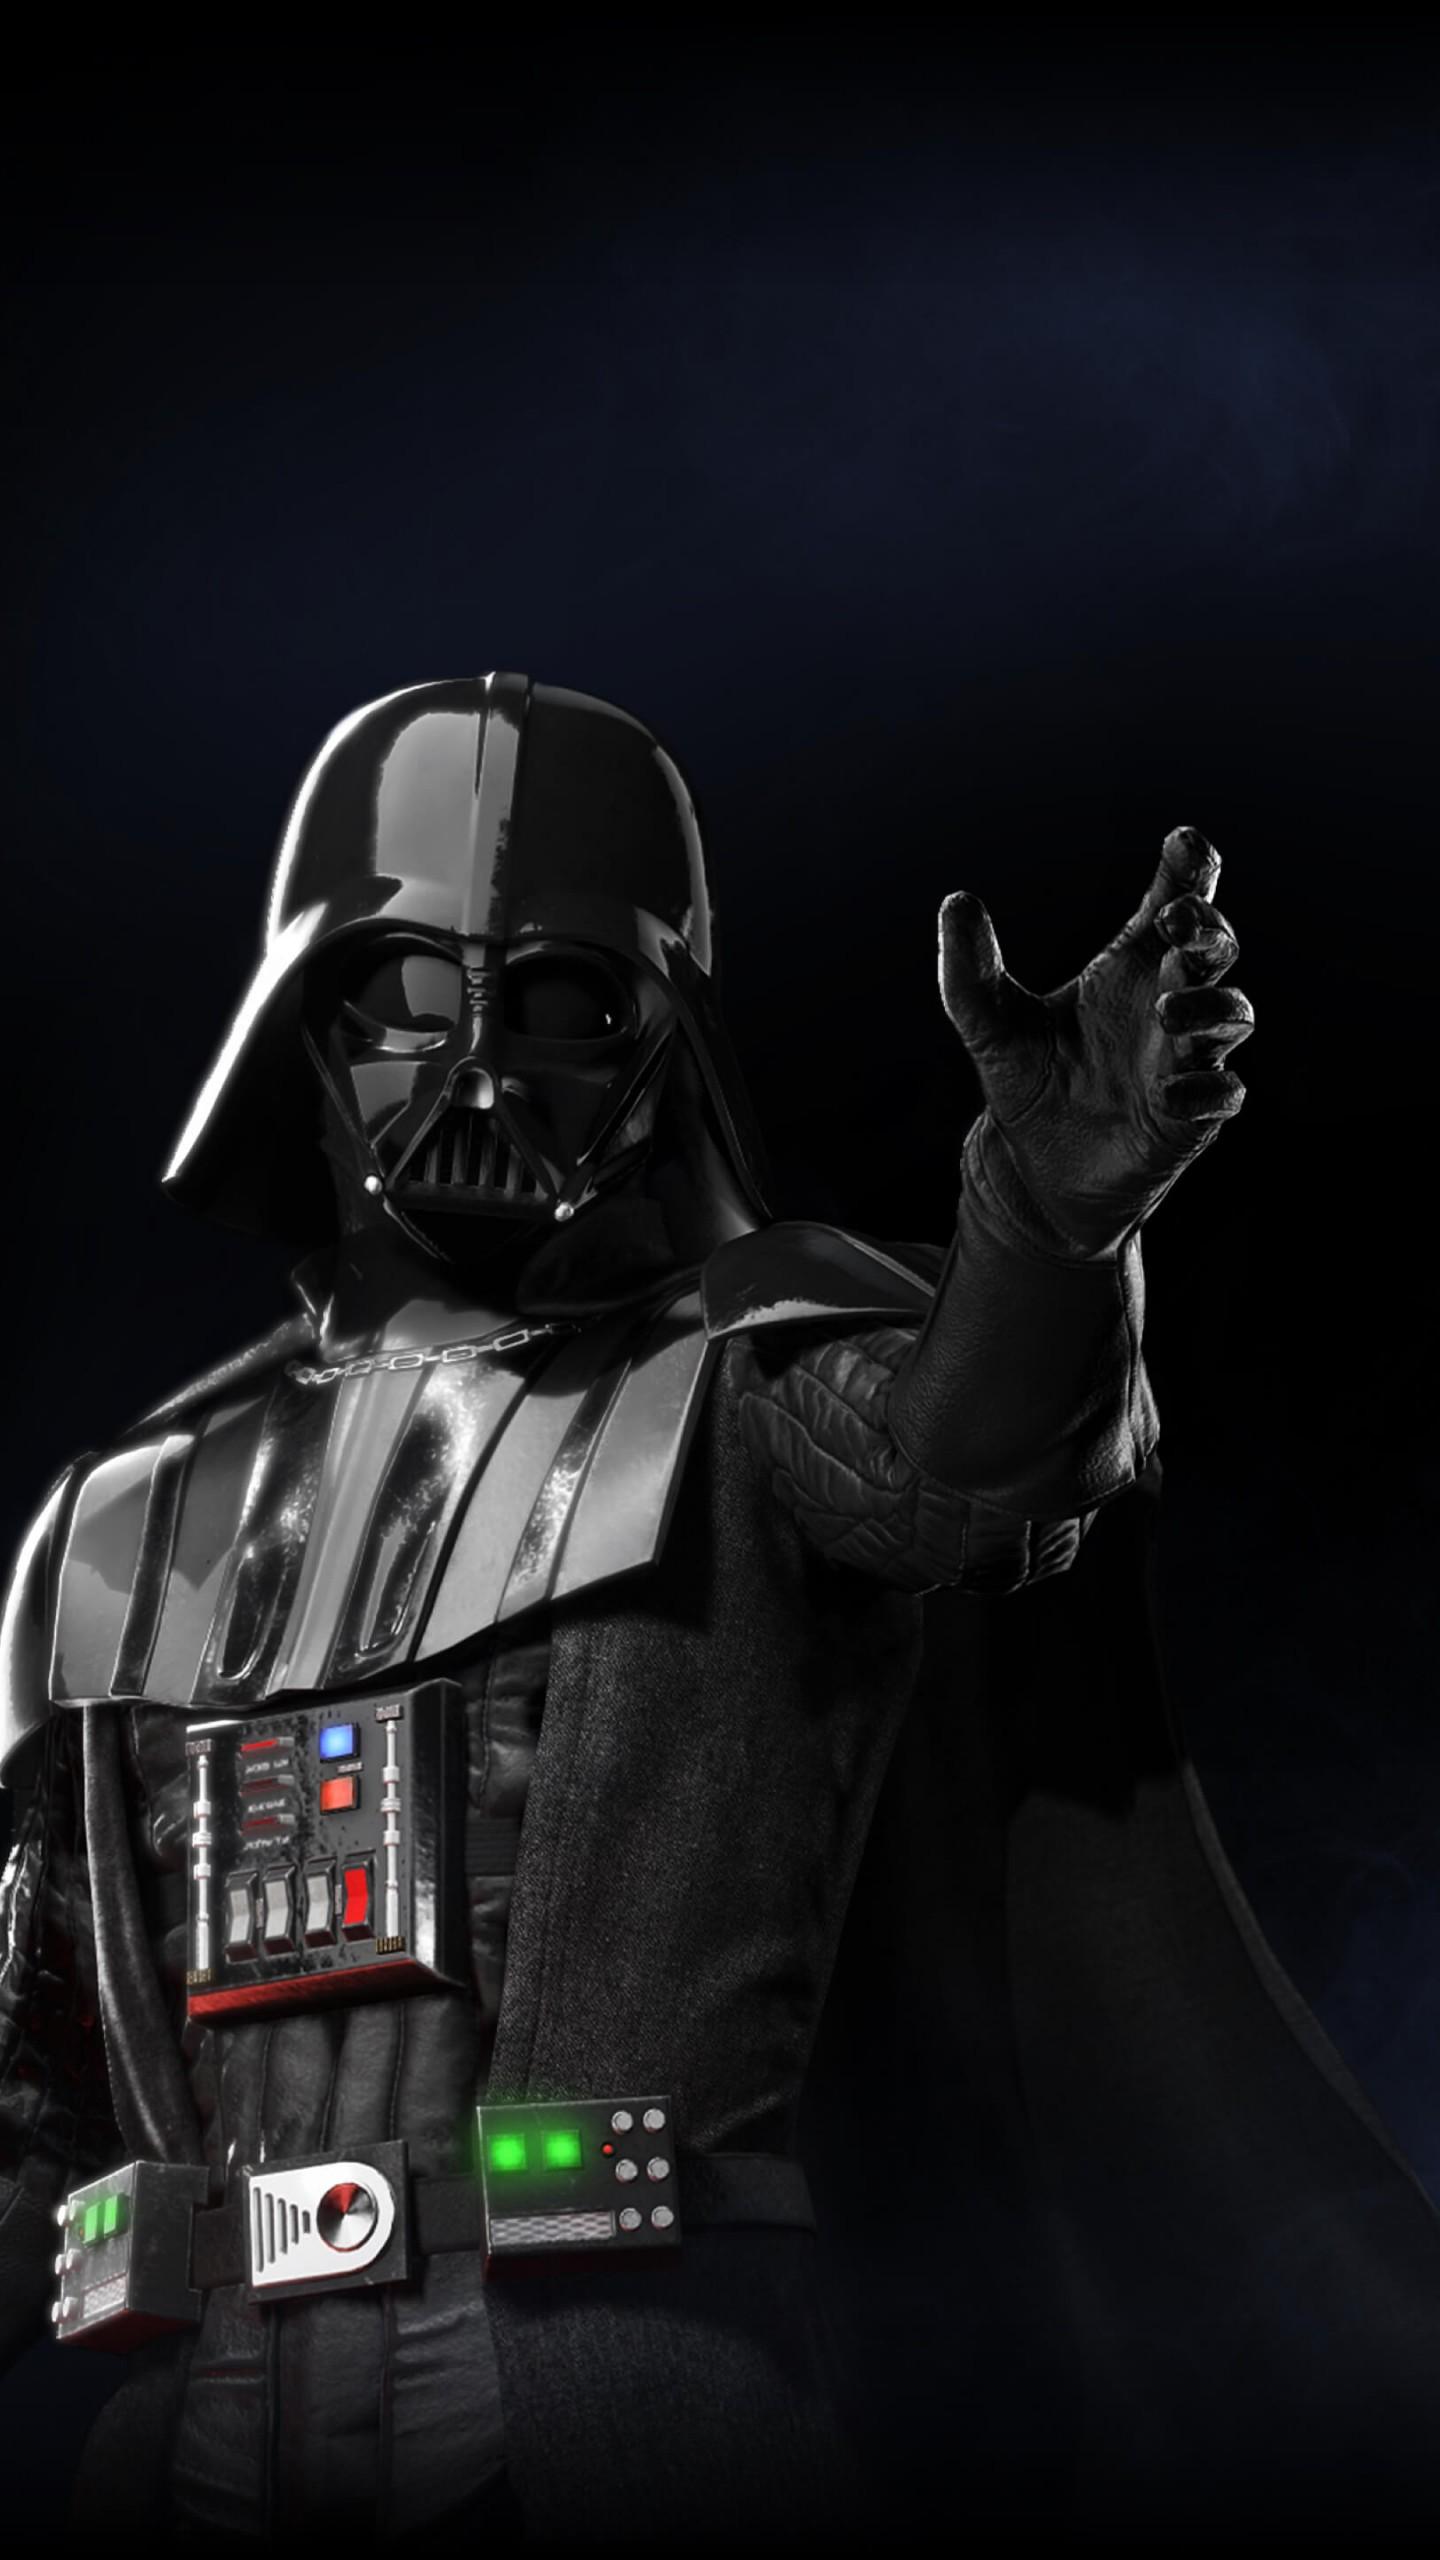 Star Wars Battlefront 2 Darth Vader 1440x2560 Wallpaper Teahub Io